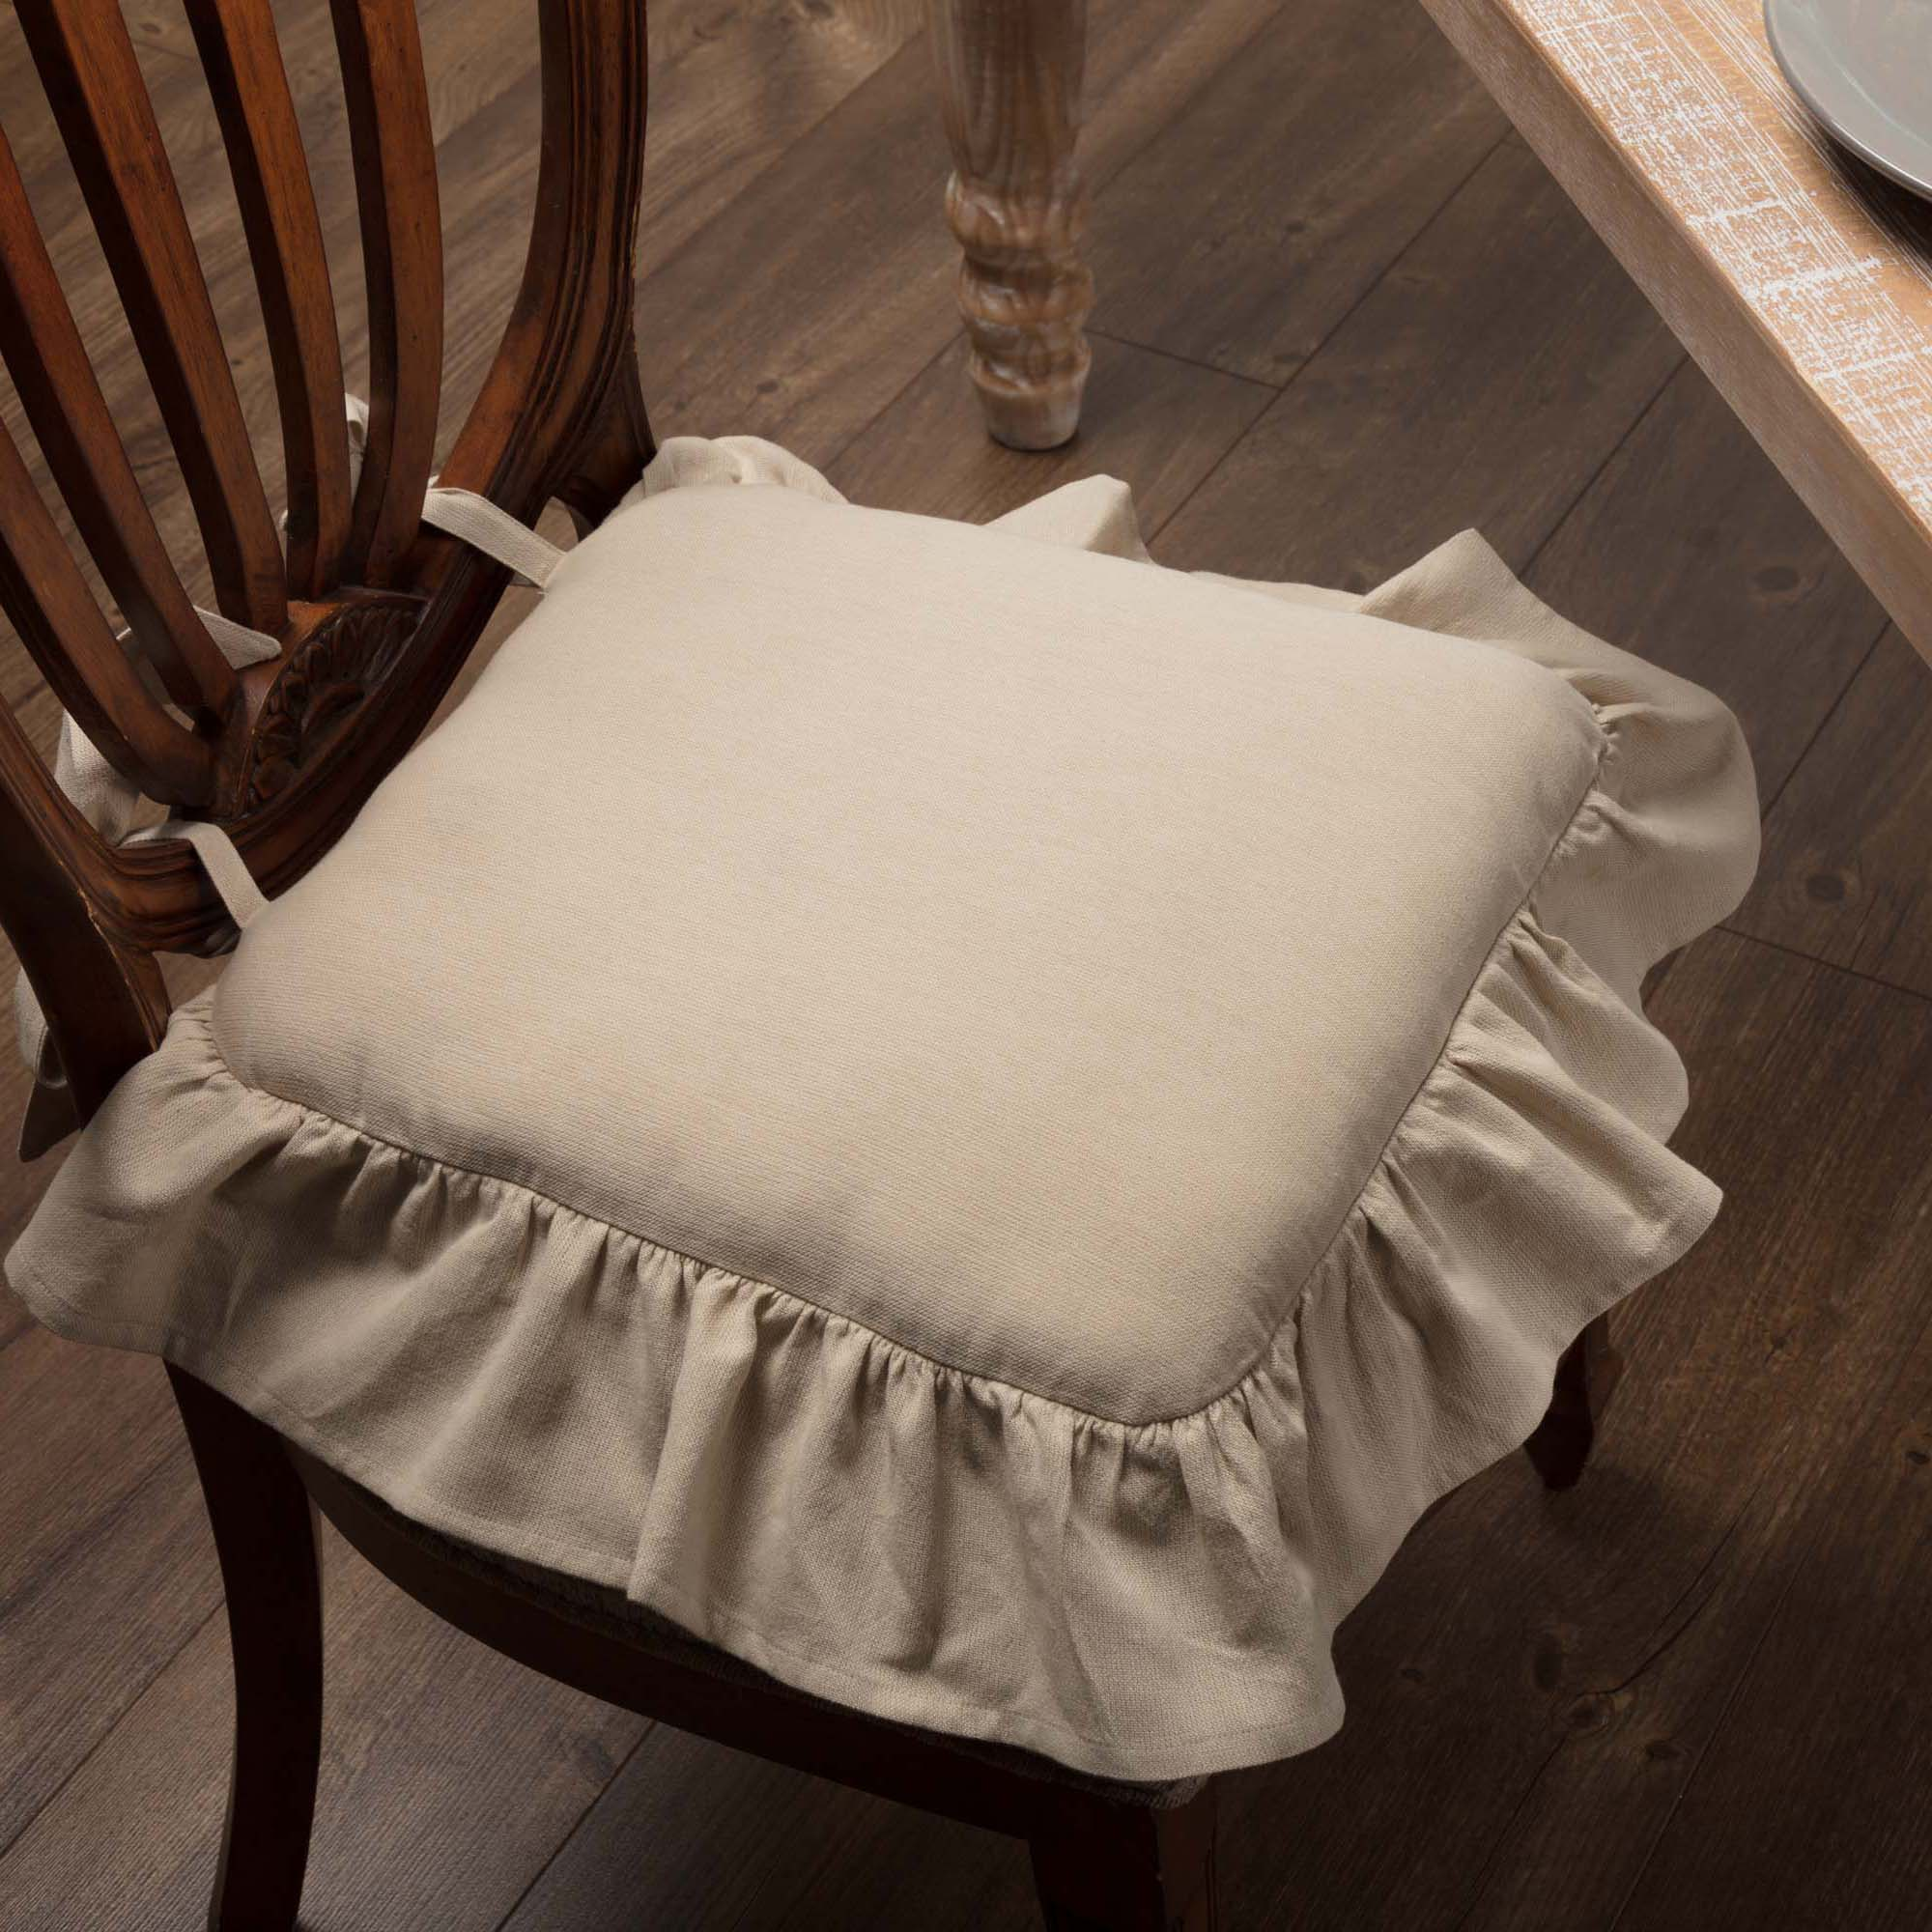 fall kitchen curtains single bowl undermount sink ruffled chambray natural chair pad - piper classics